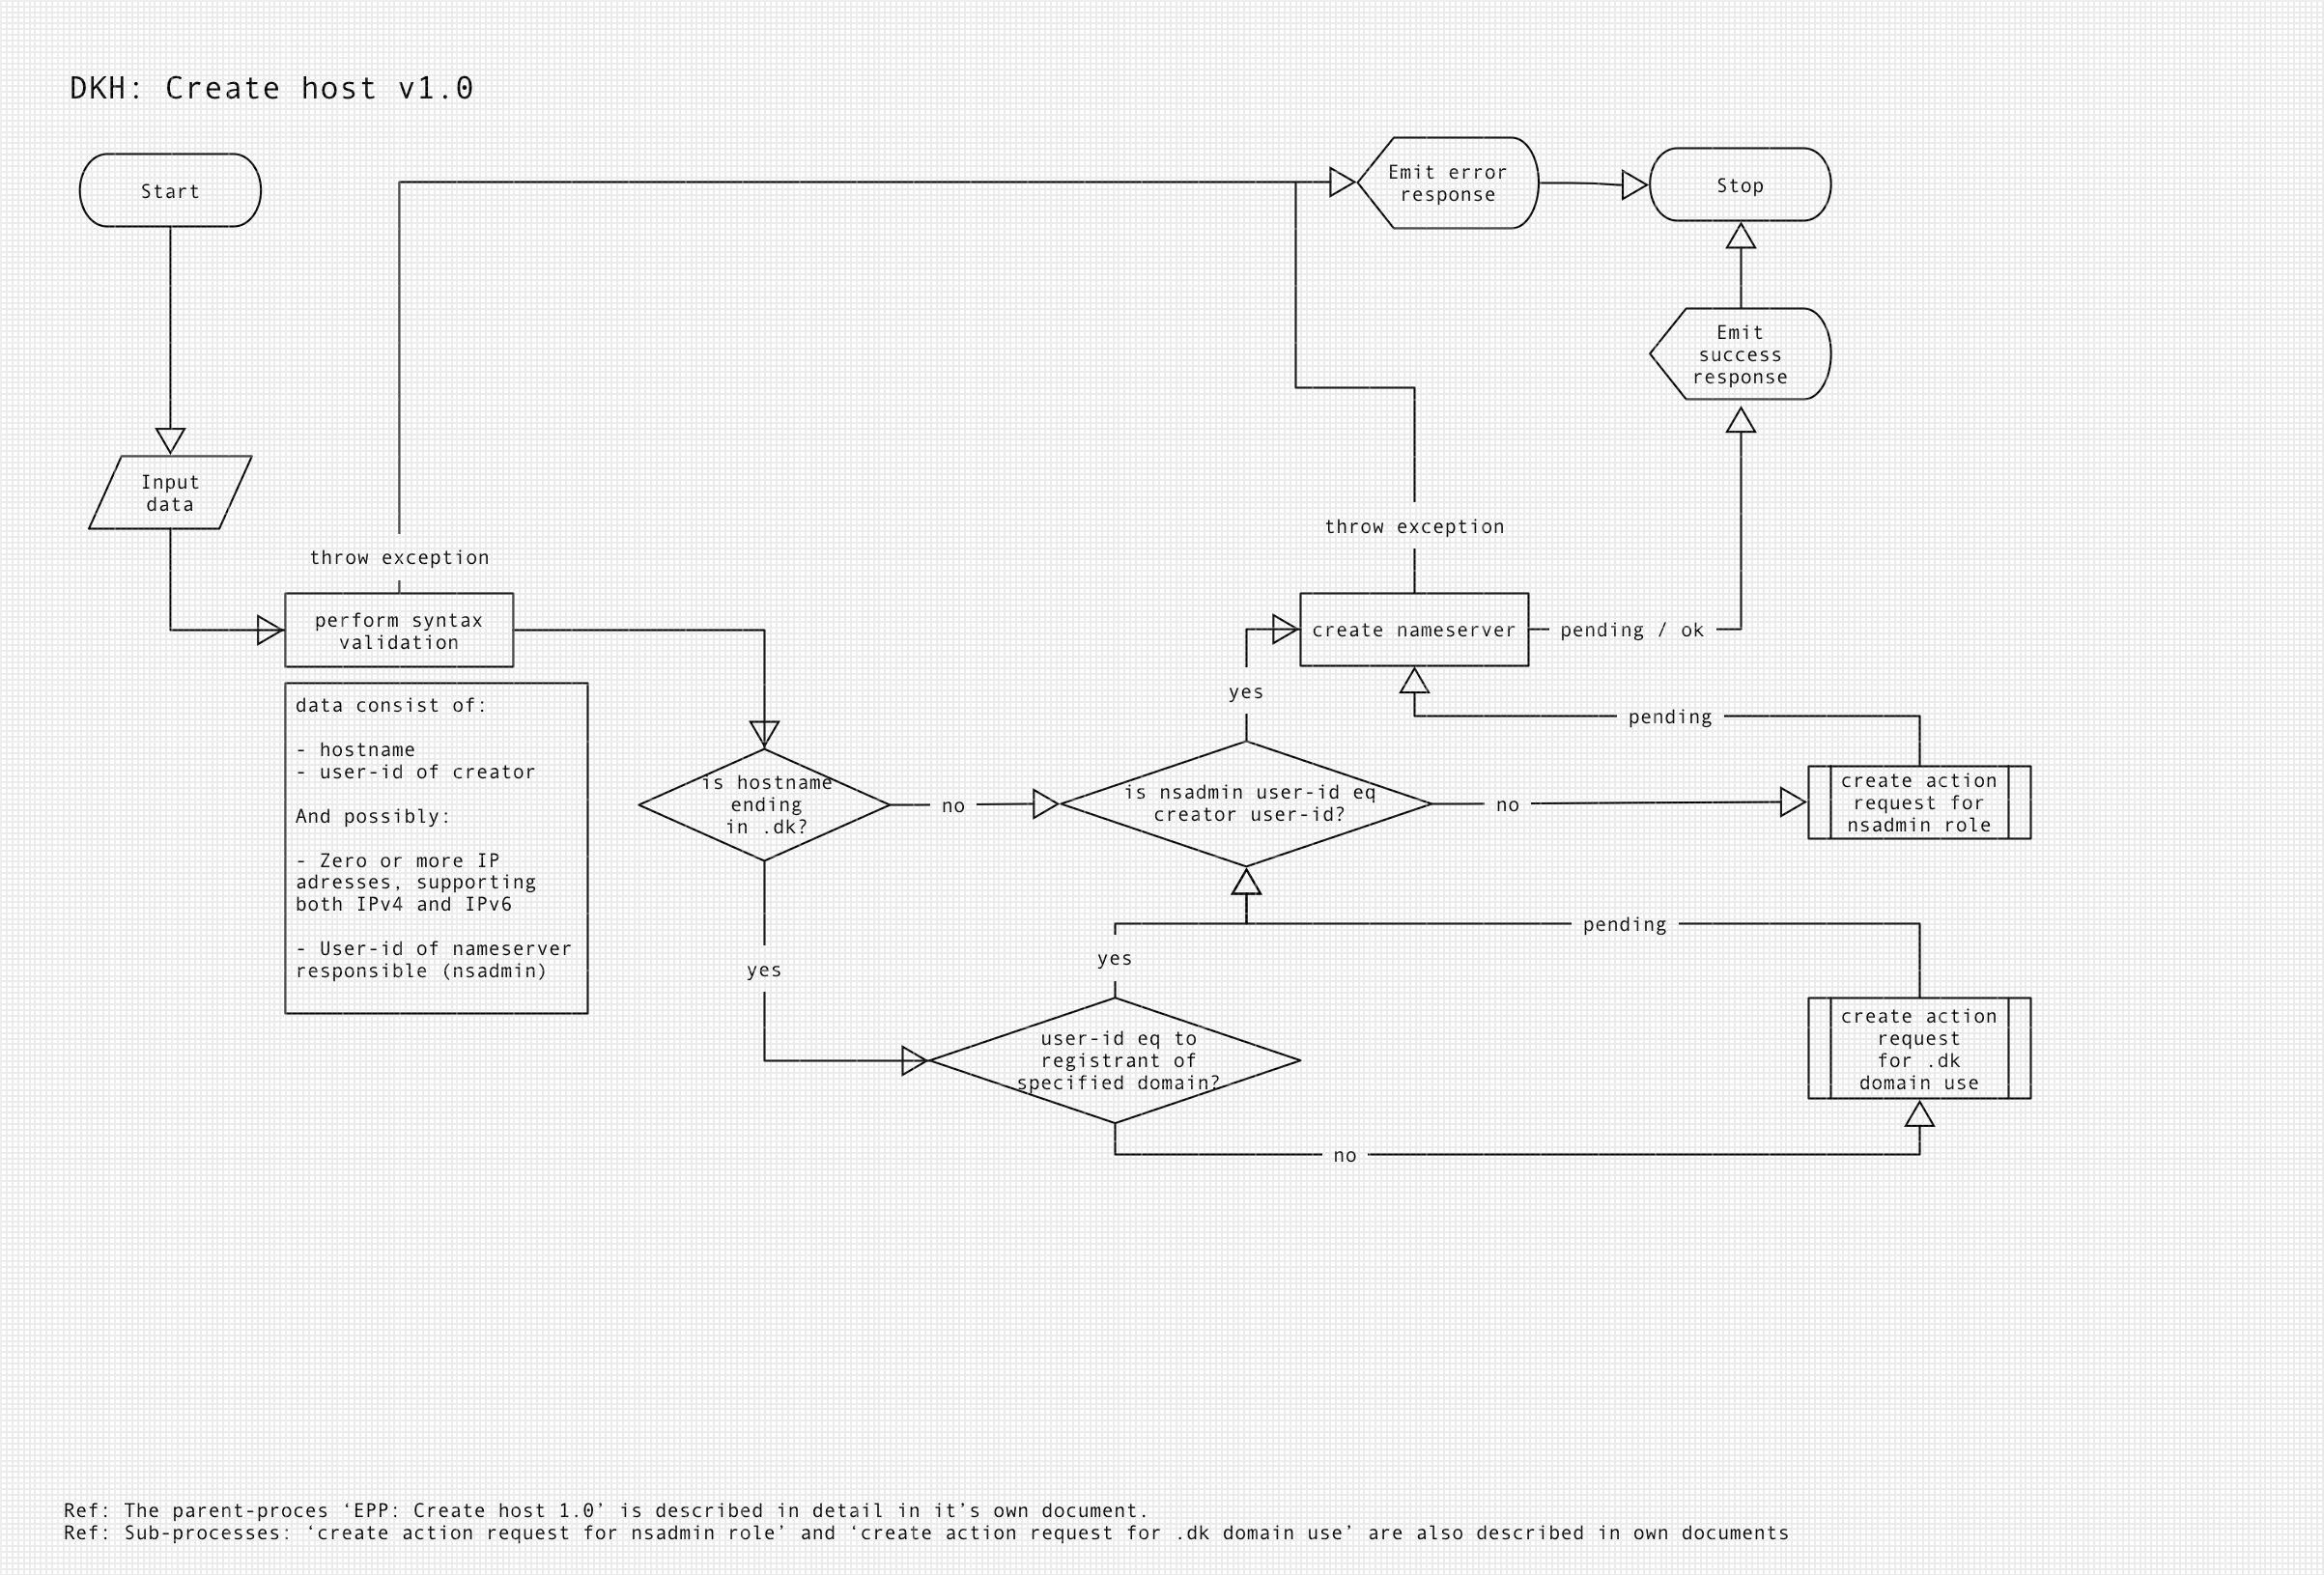 Diagram of DKH create host